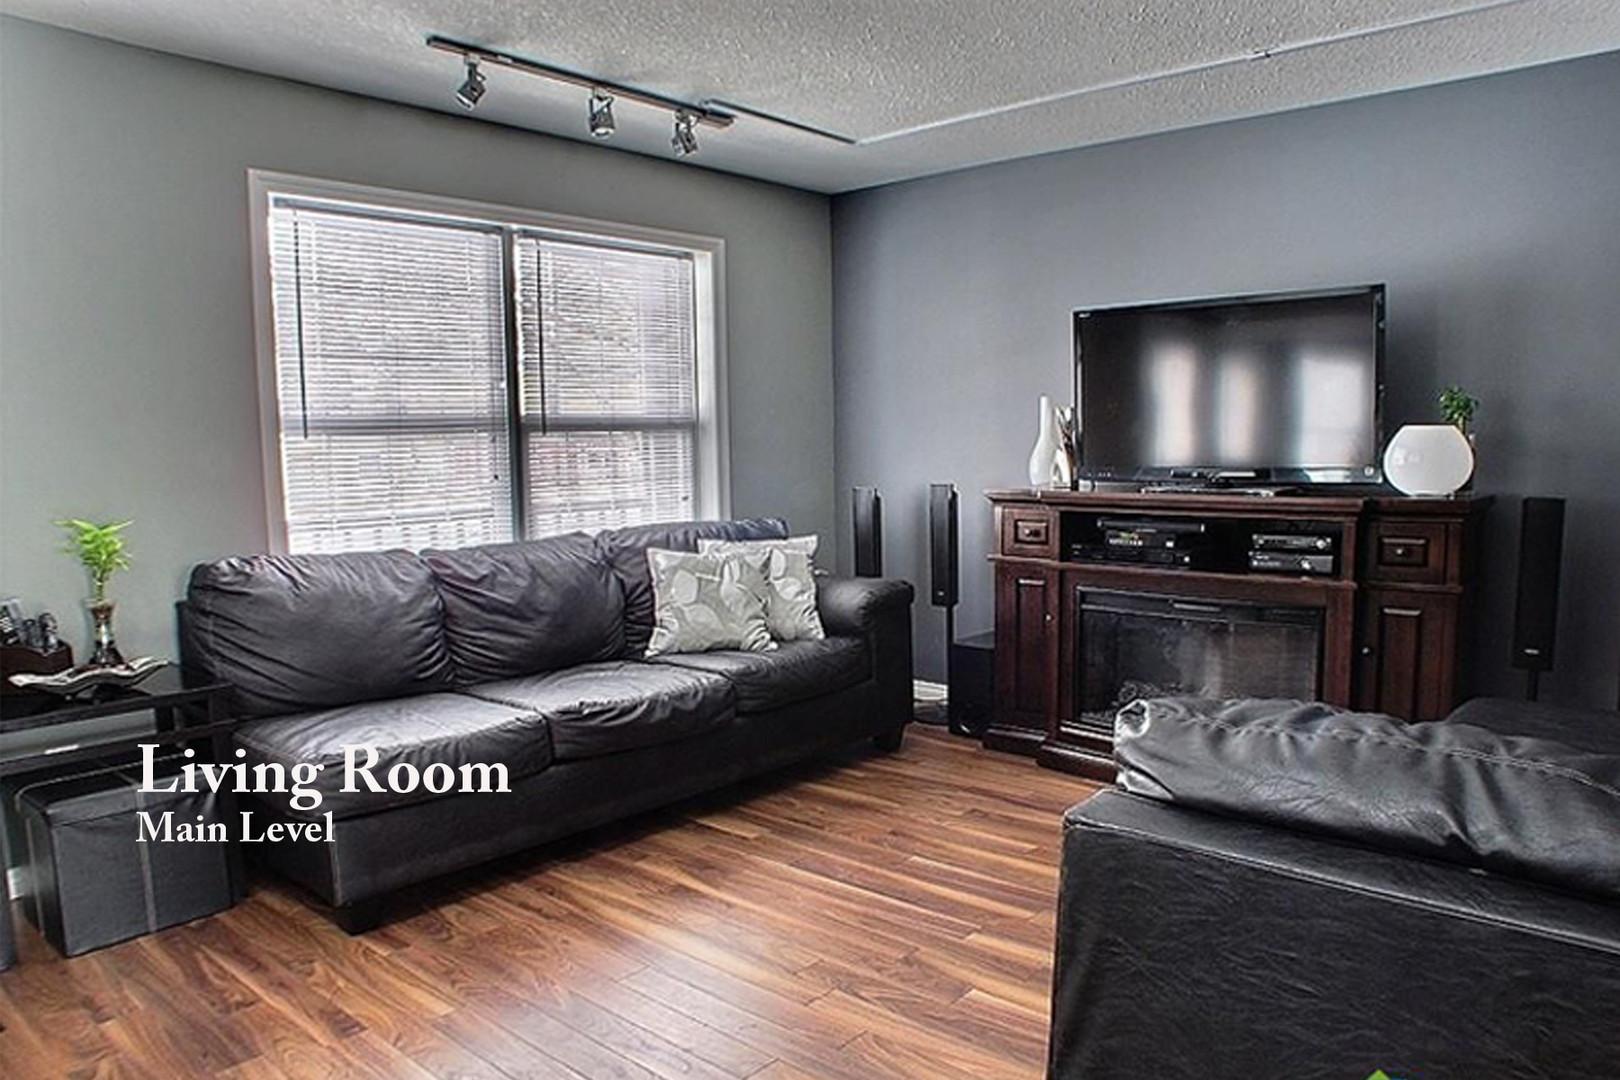 Living Room Main level.jfif